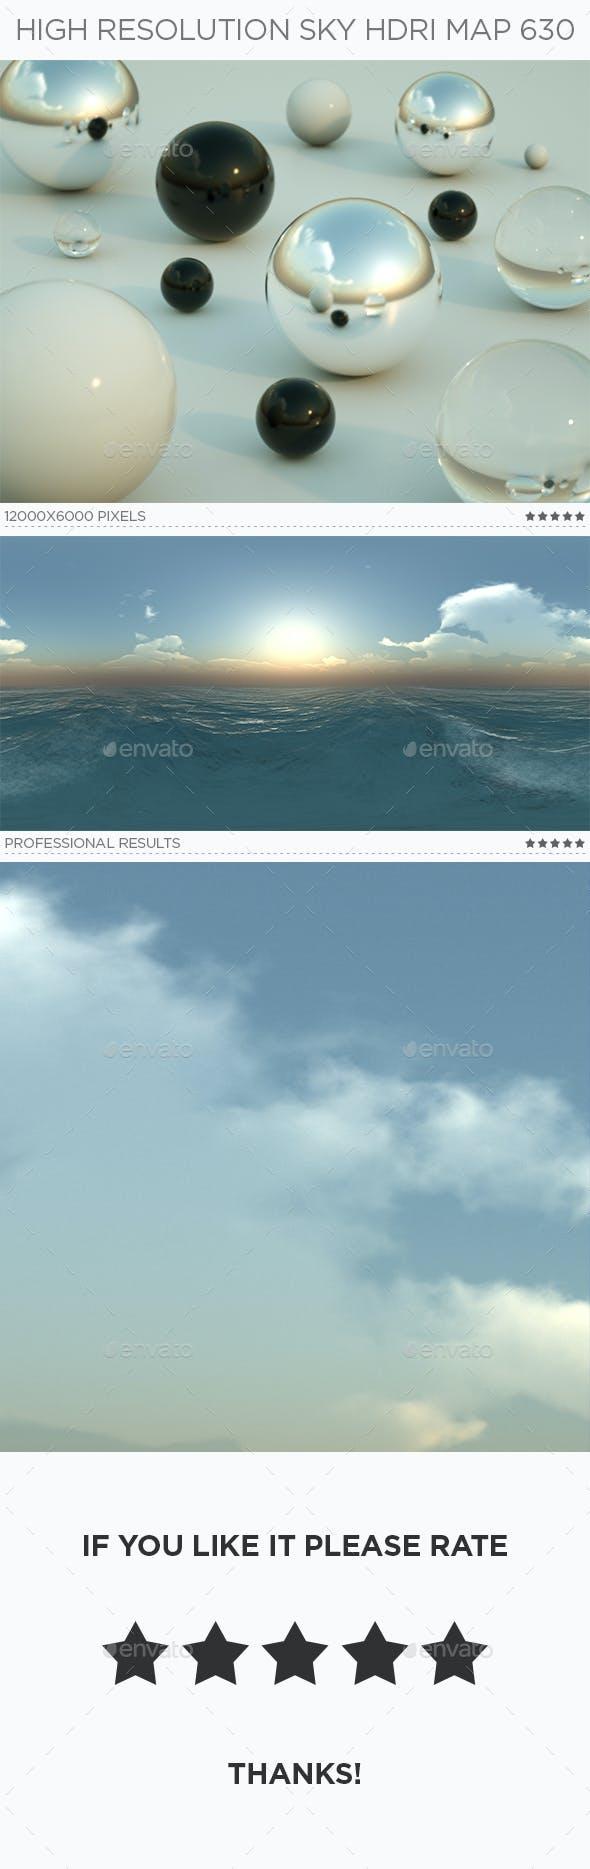 High Resolution Sky HDRi Map 630 - 3DOcean Item for Sale